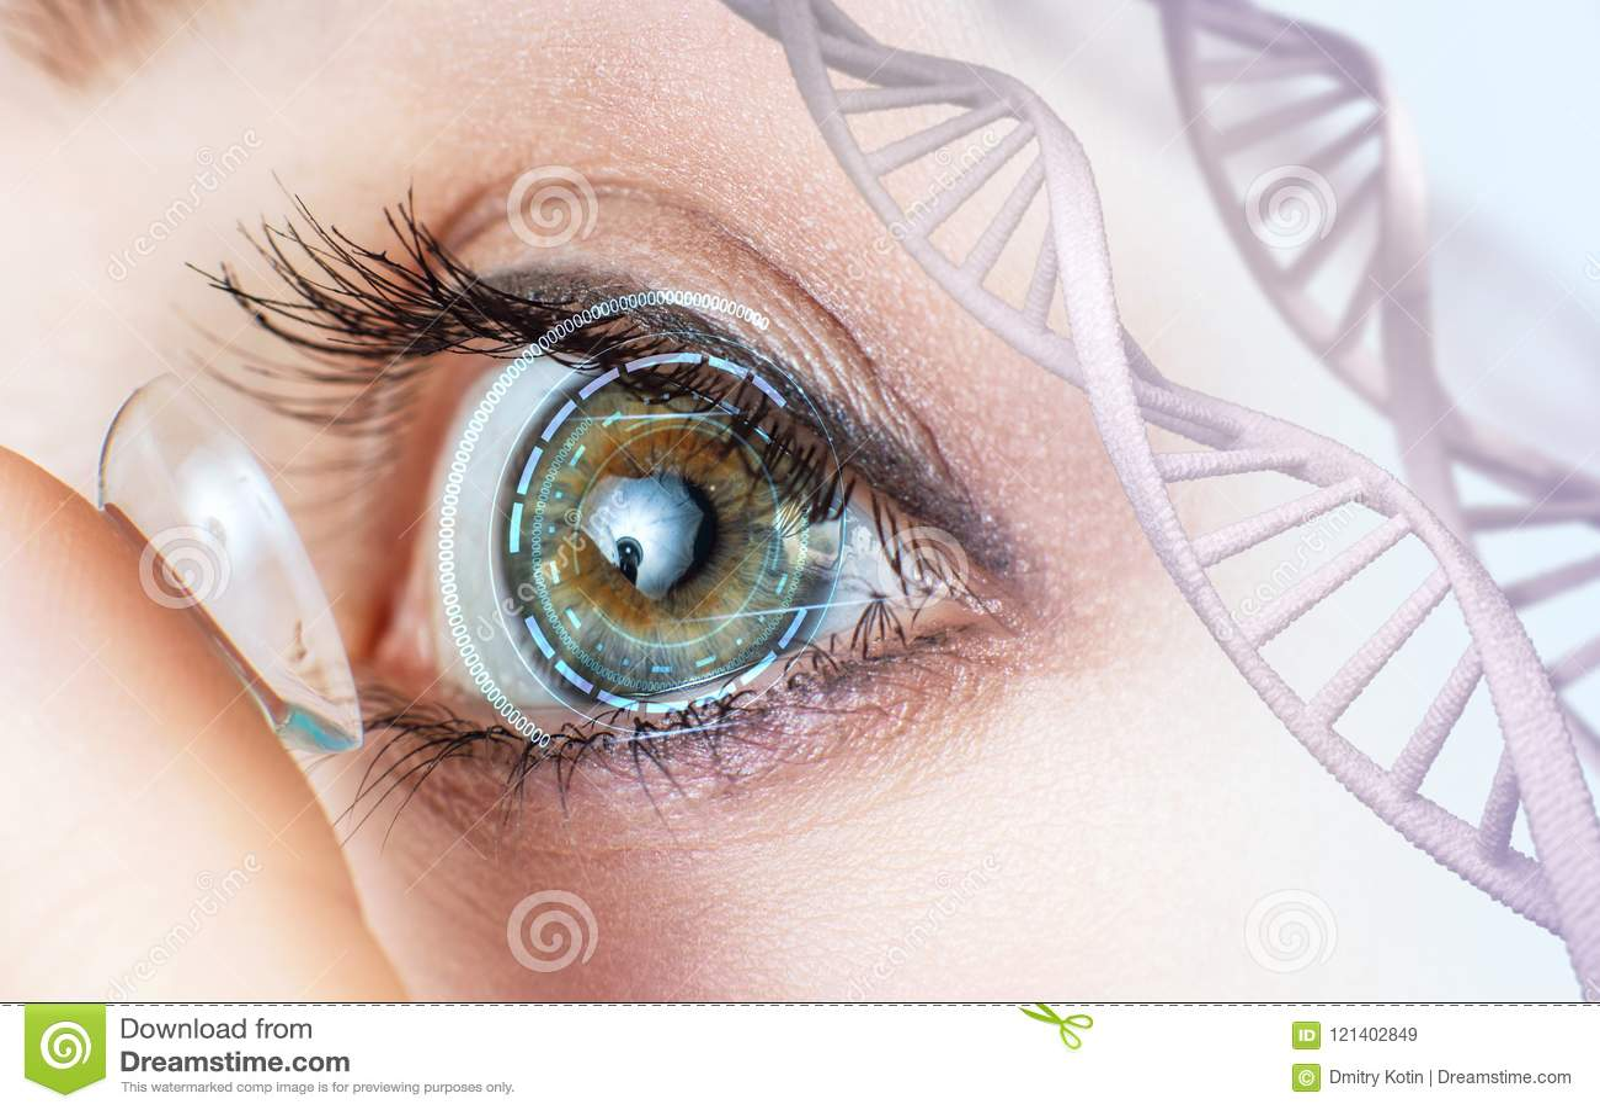 Lente de contato vestindo da mulher entre hastes do ADN